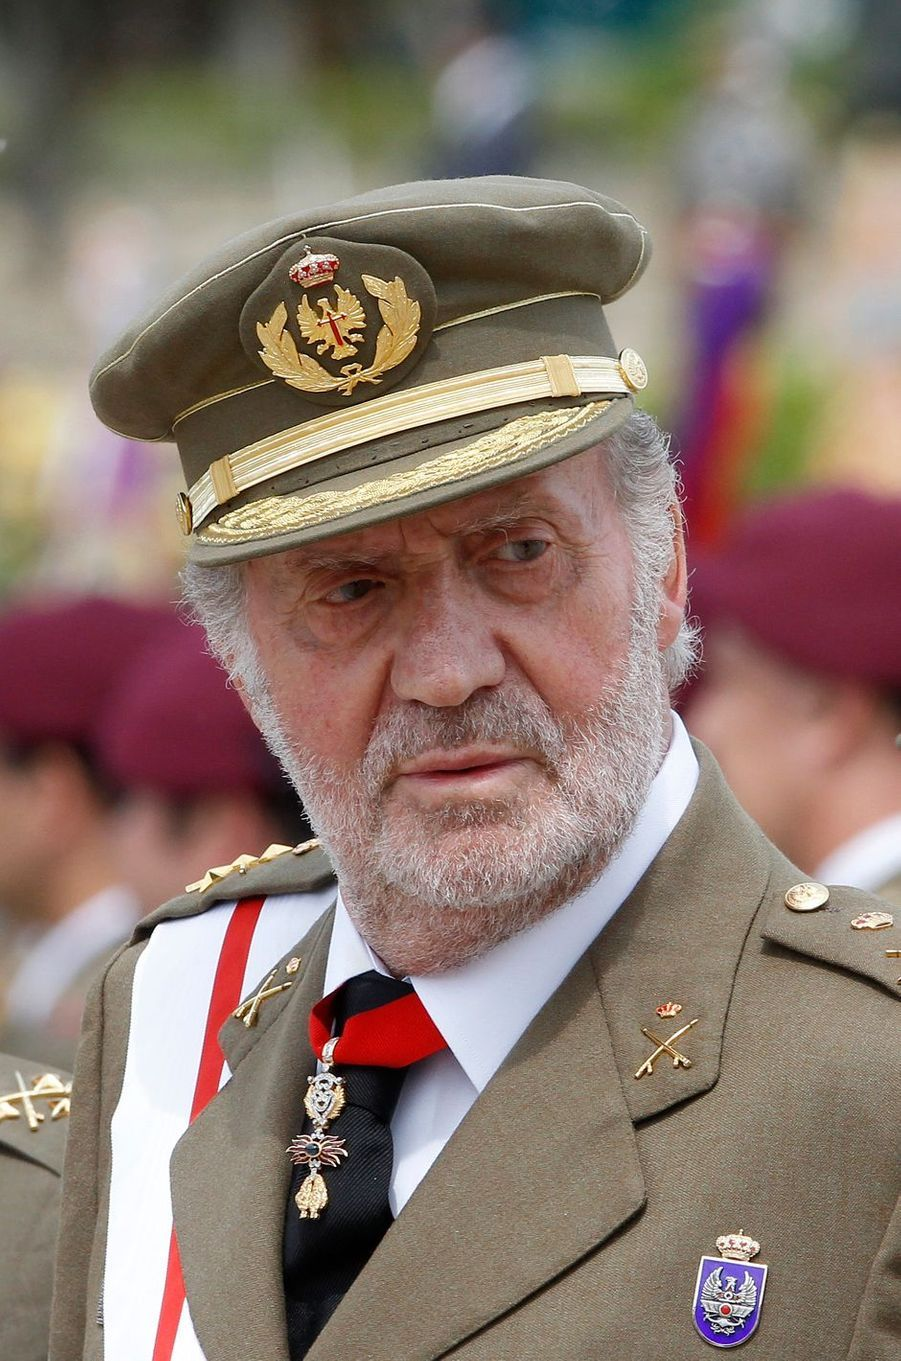 Le roi Juan Carlos Ier d'Espagne, le 18 mai 2011